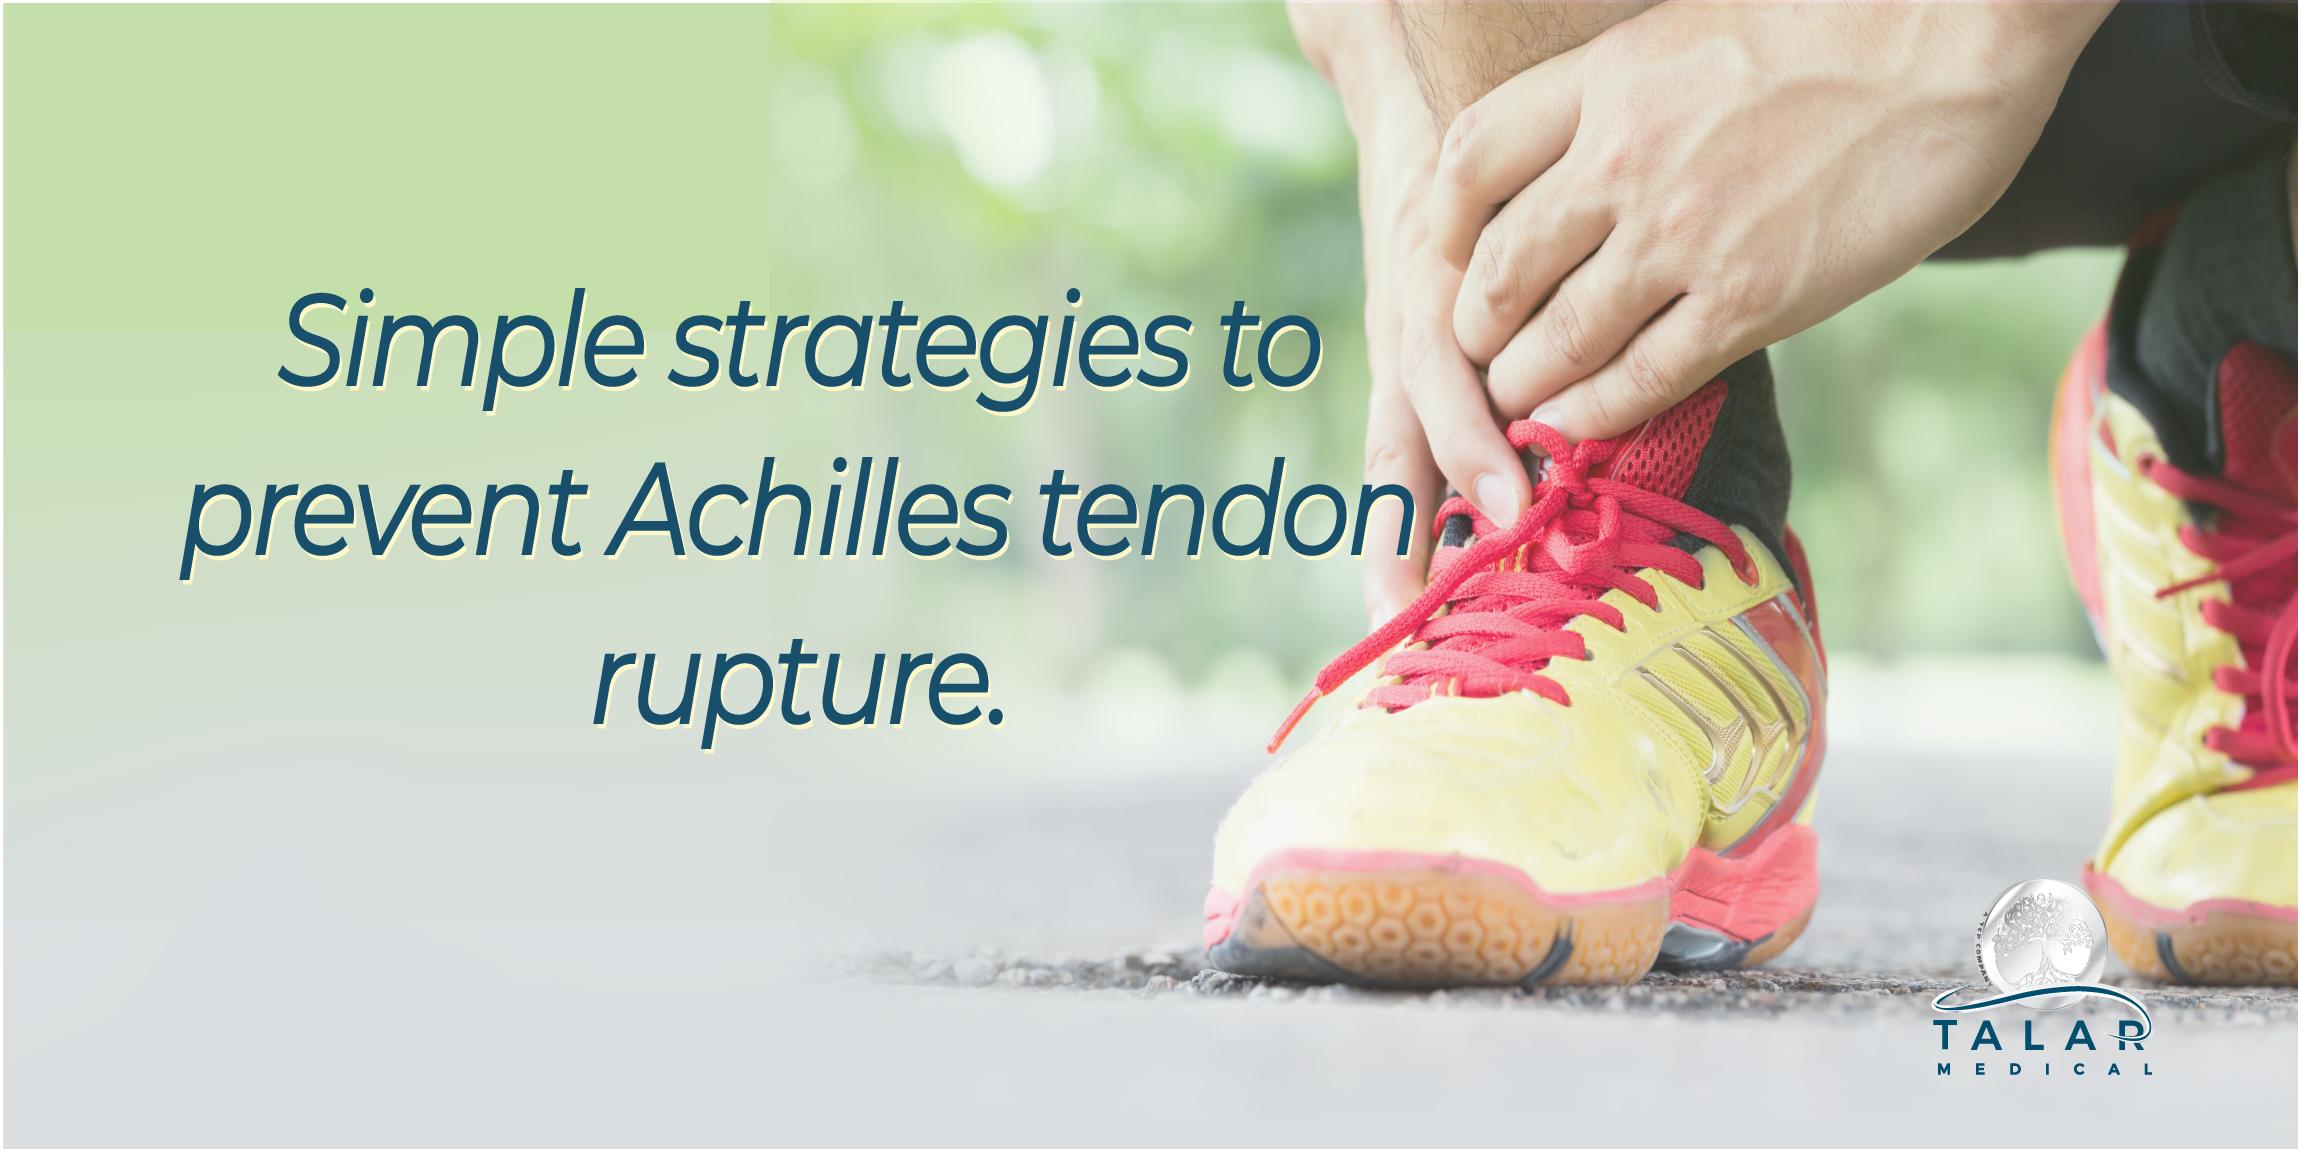 Achillies tendon rupture